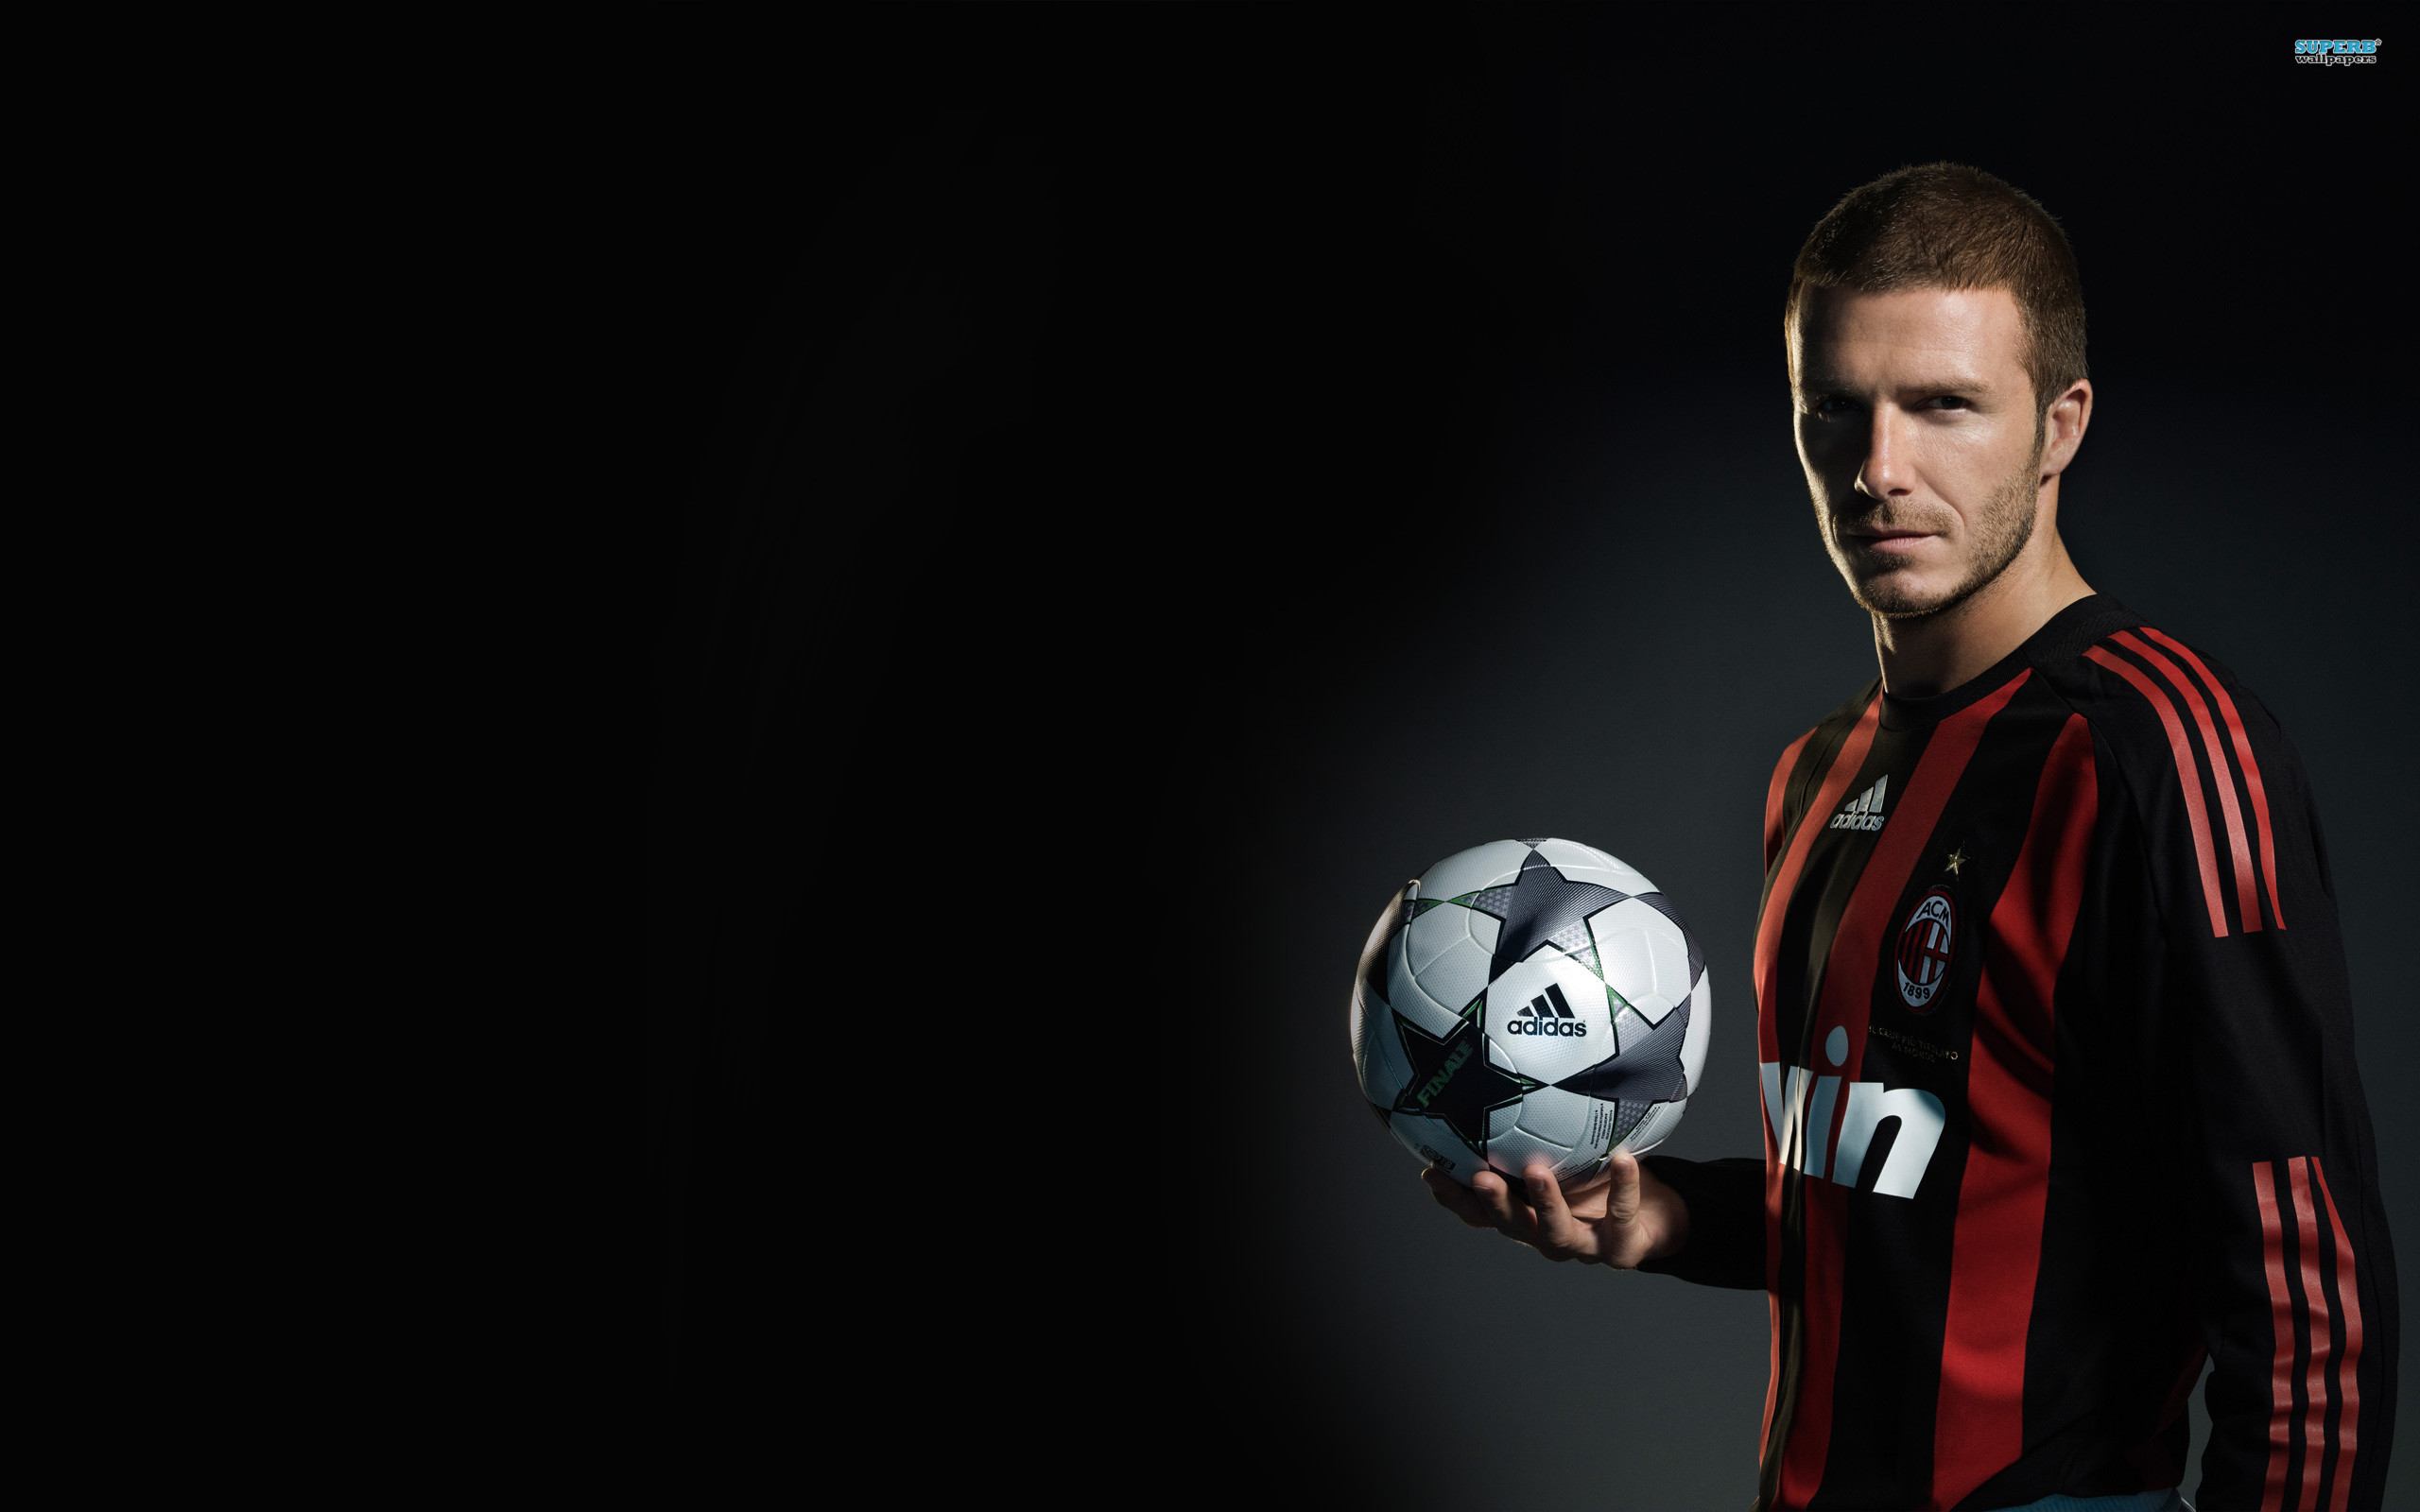 David Beckham Wallpapers 53 Images